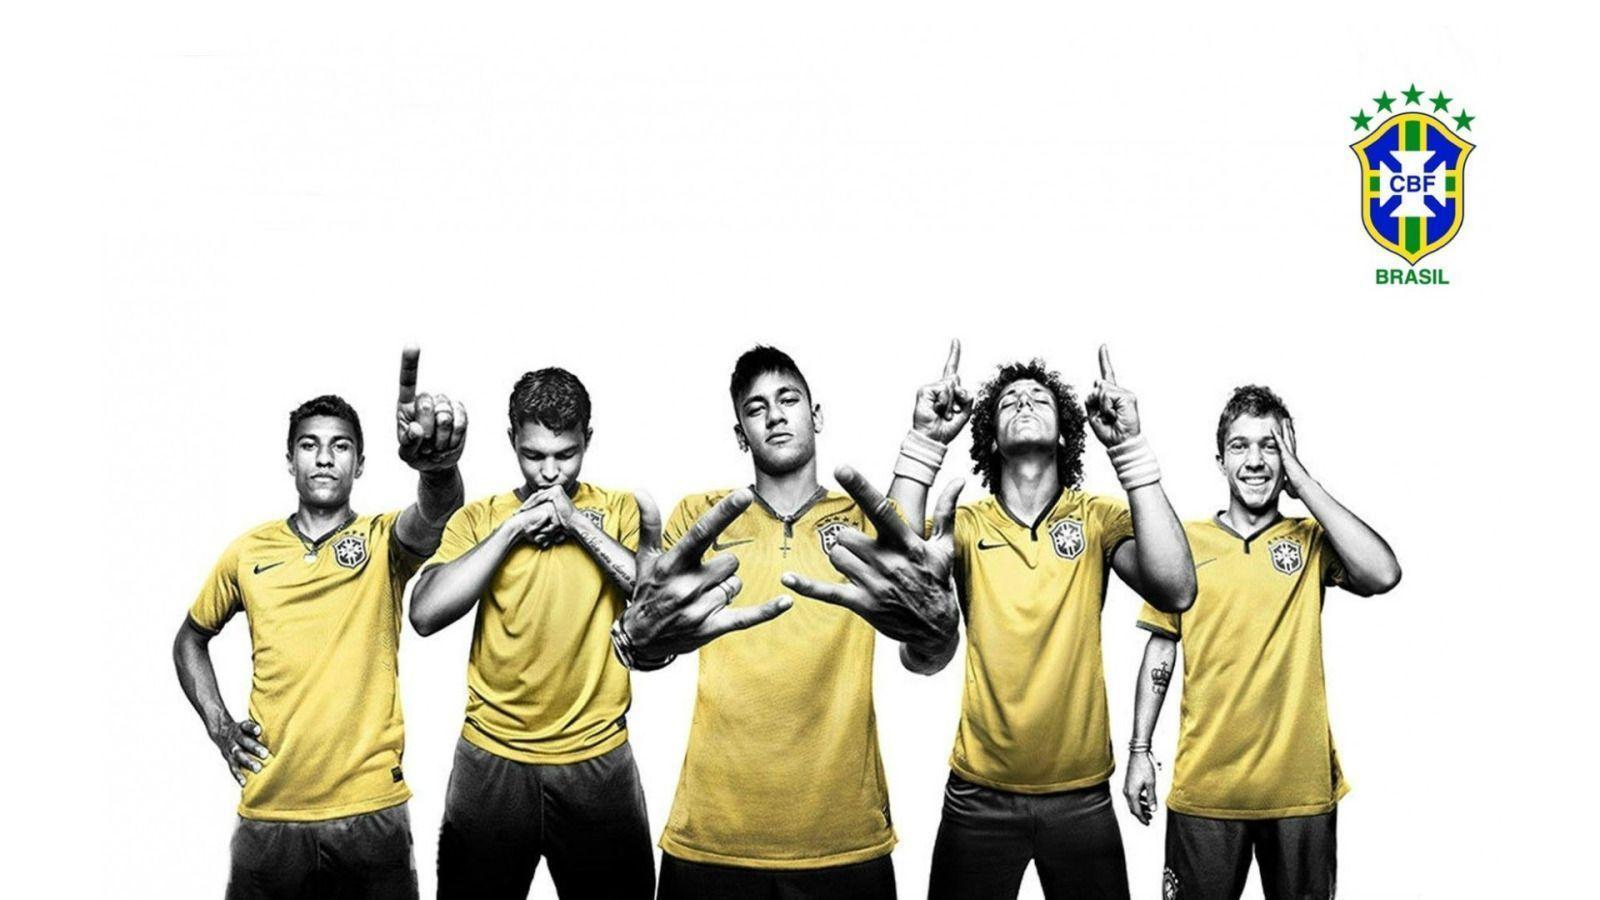 football brazil wallpaper stars - photo #19